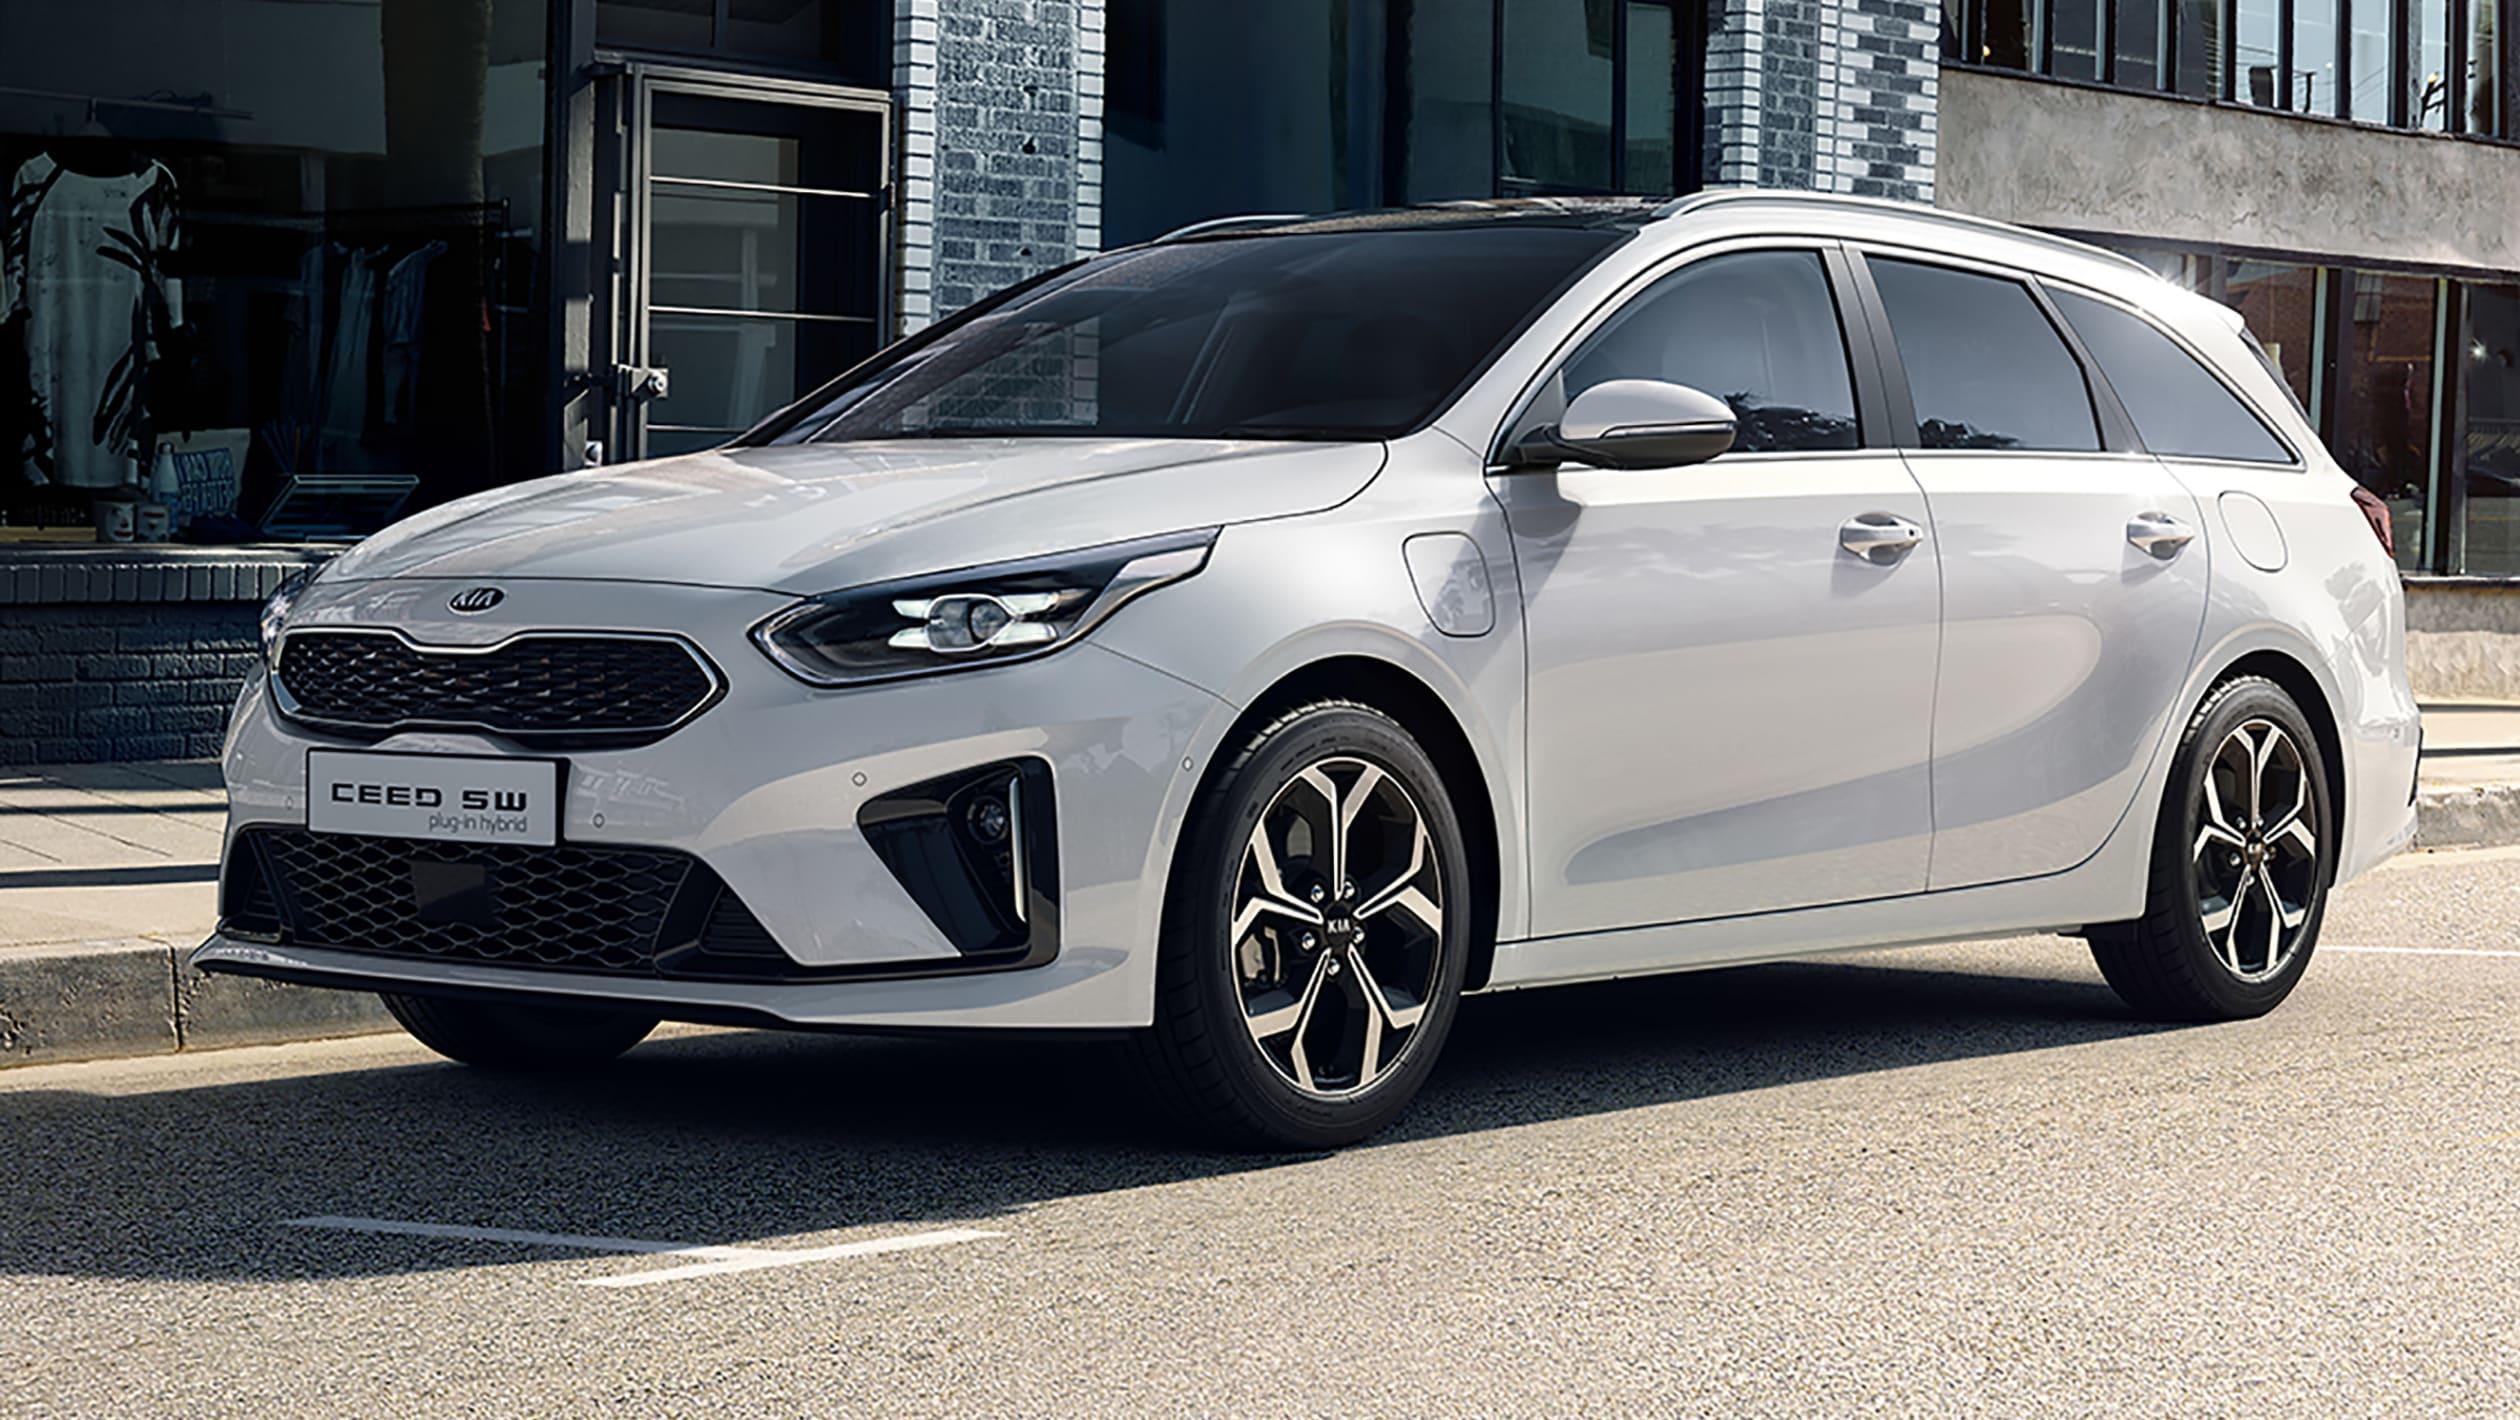 Saab For Sale >> New 2020 Kia Ceed Sportswagon Plug-in hybrid goes on sale | Auto Express